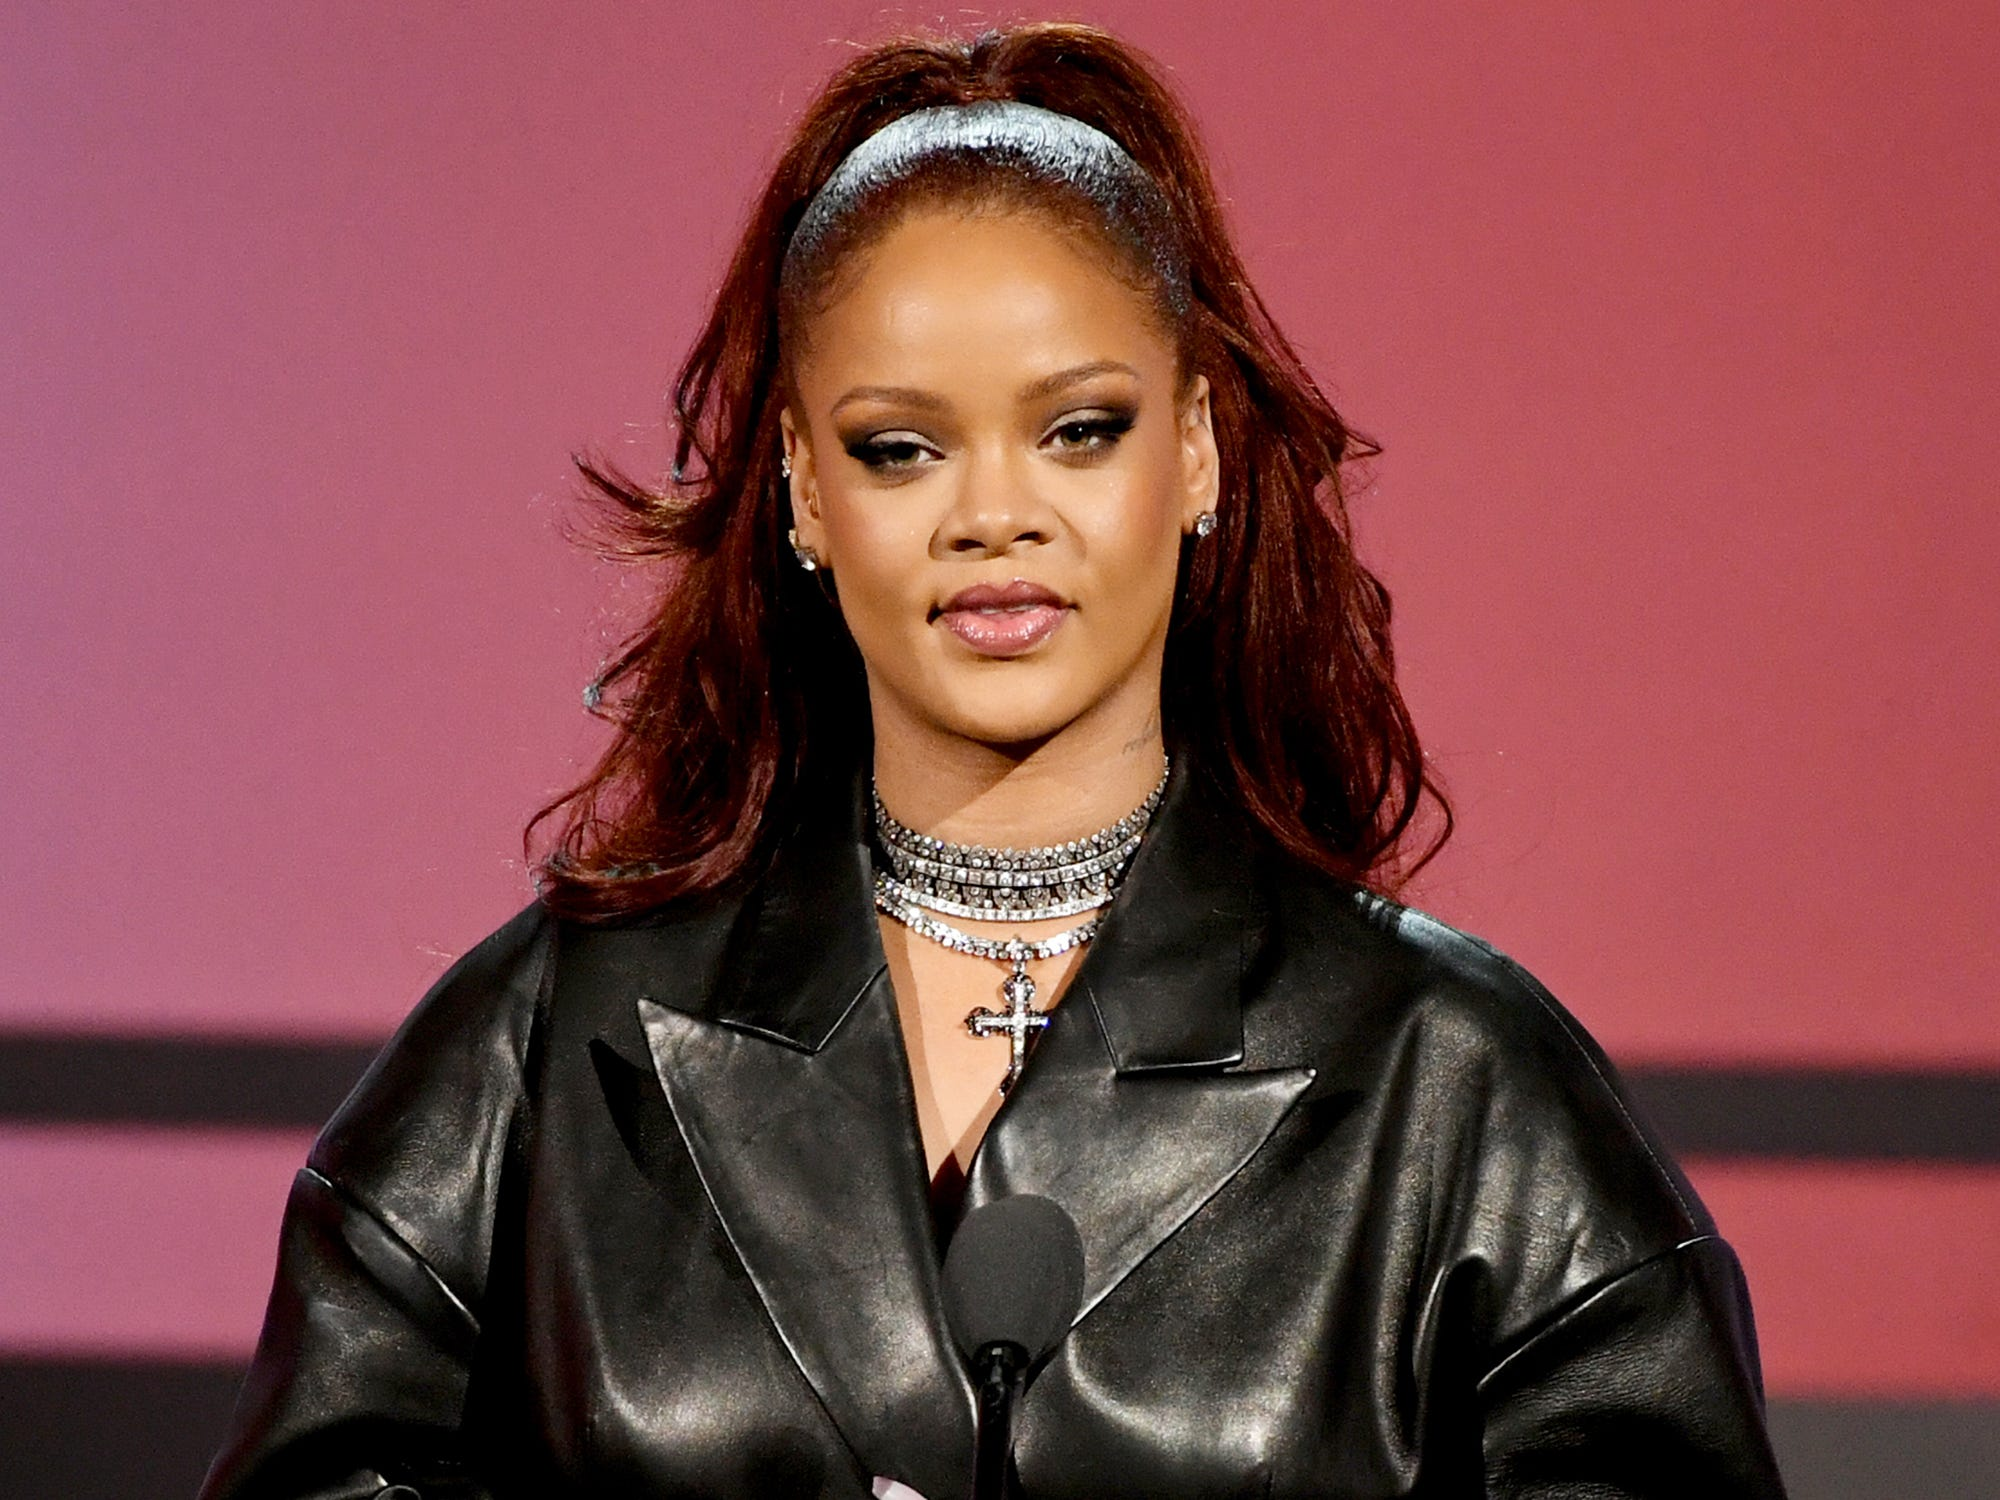 b49385d6270d1b Rihanna's Fenty Fashion Line Prices Drawing Backlash